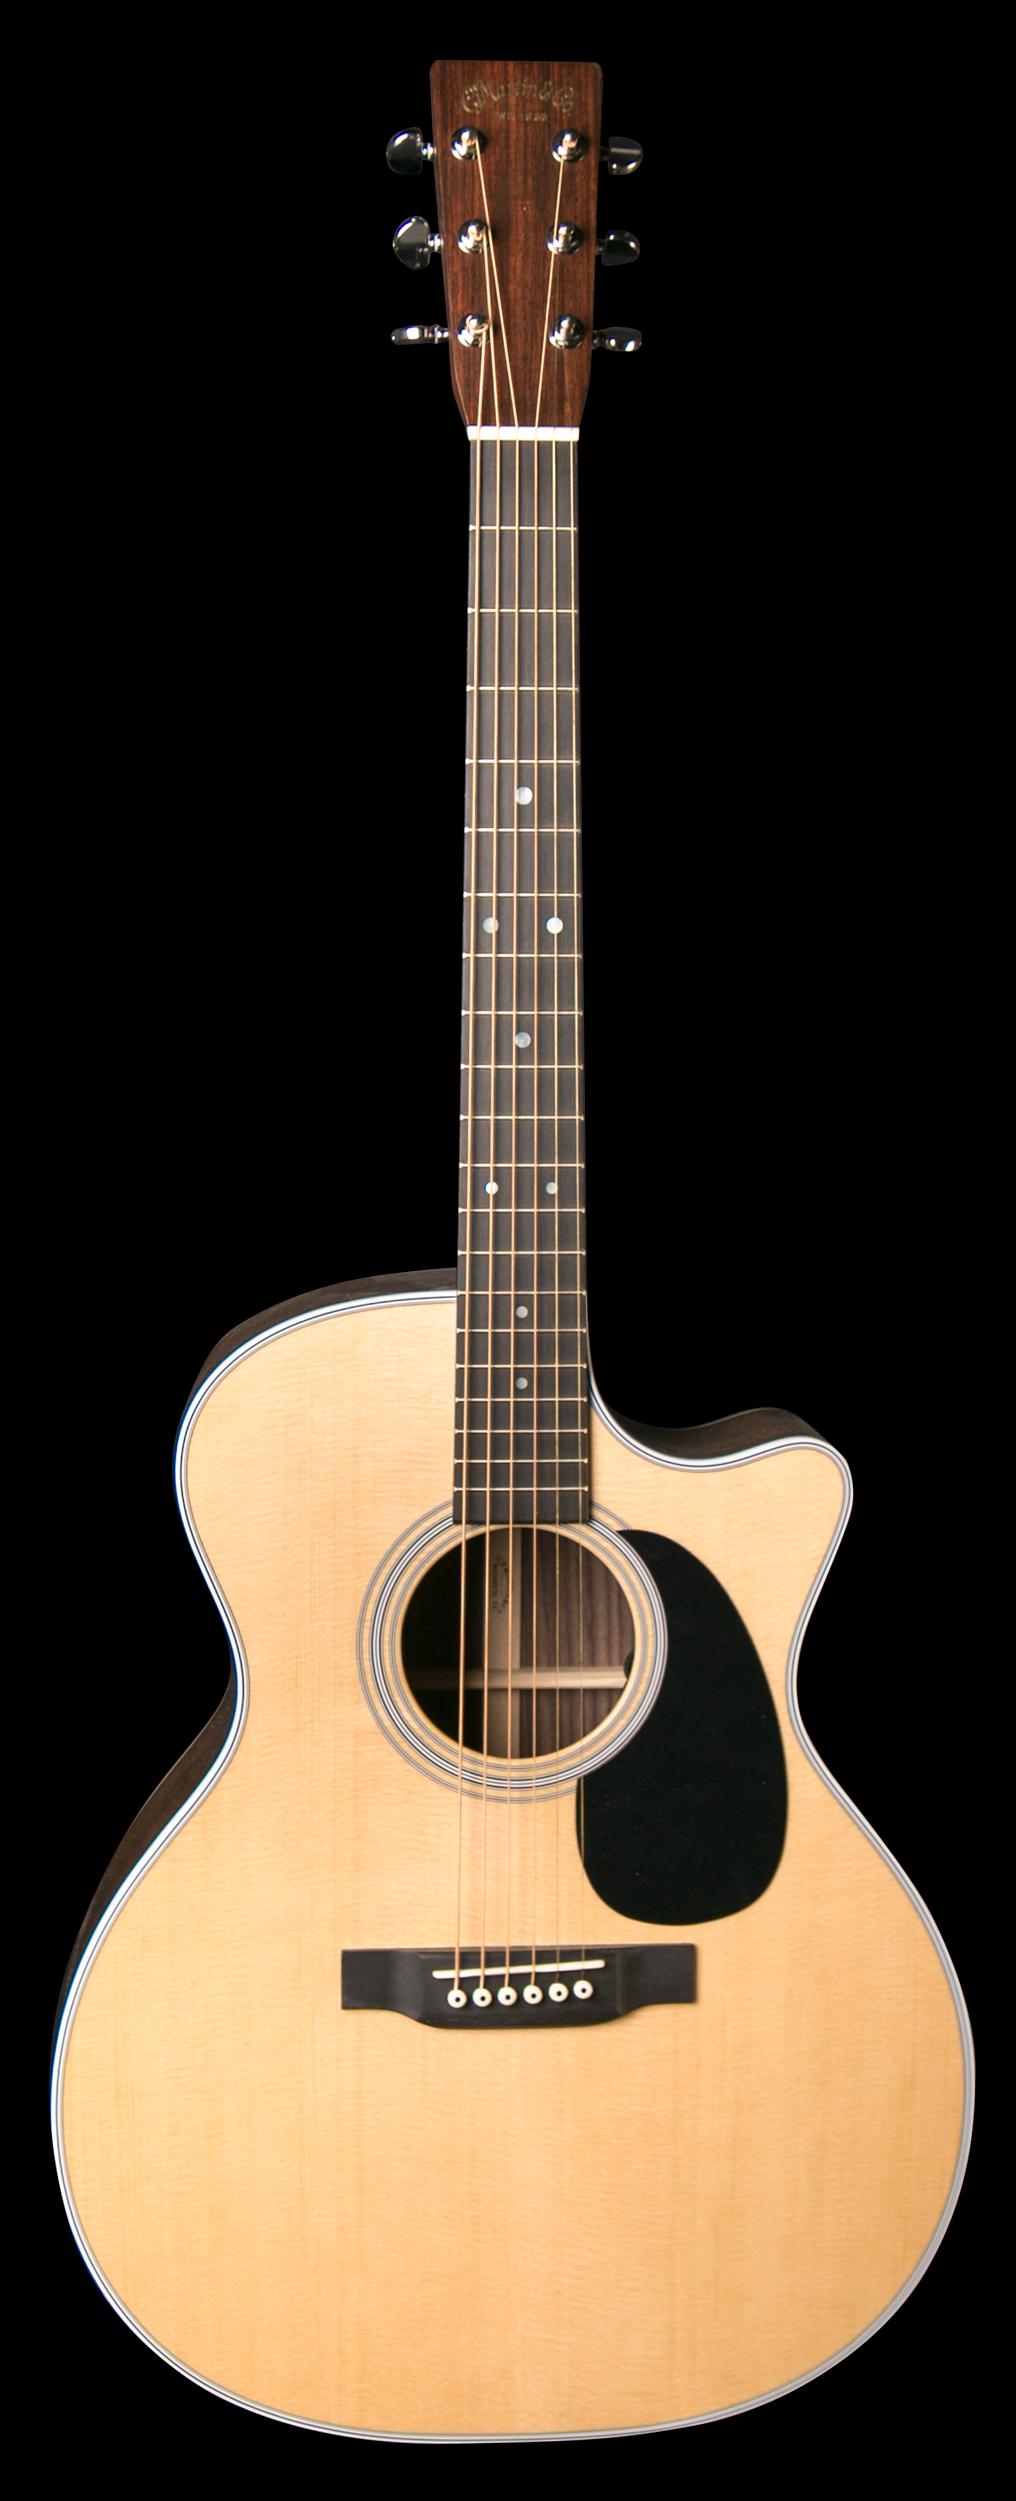 martin gpc 28e acoustic electric guitar ebay. Black Bedroom Furniture Sets. Home Design Ideas